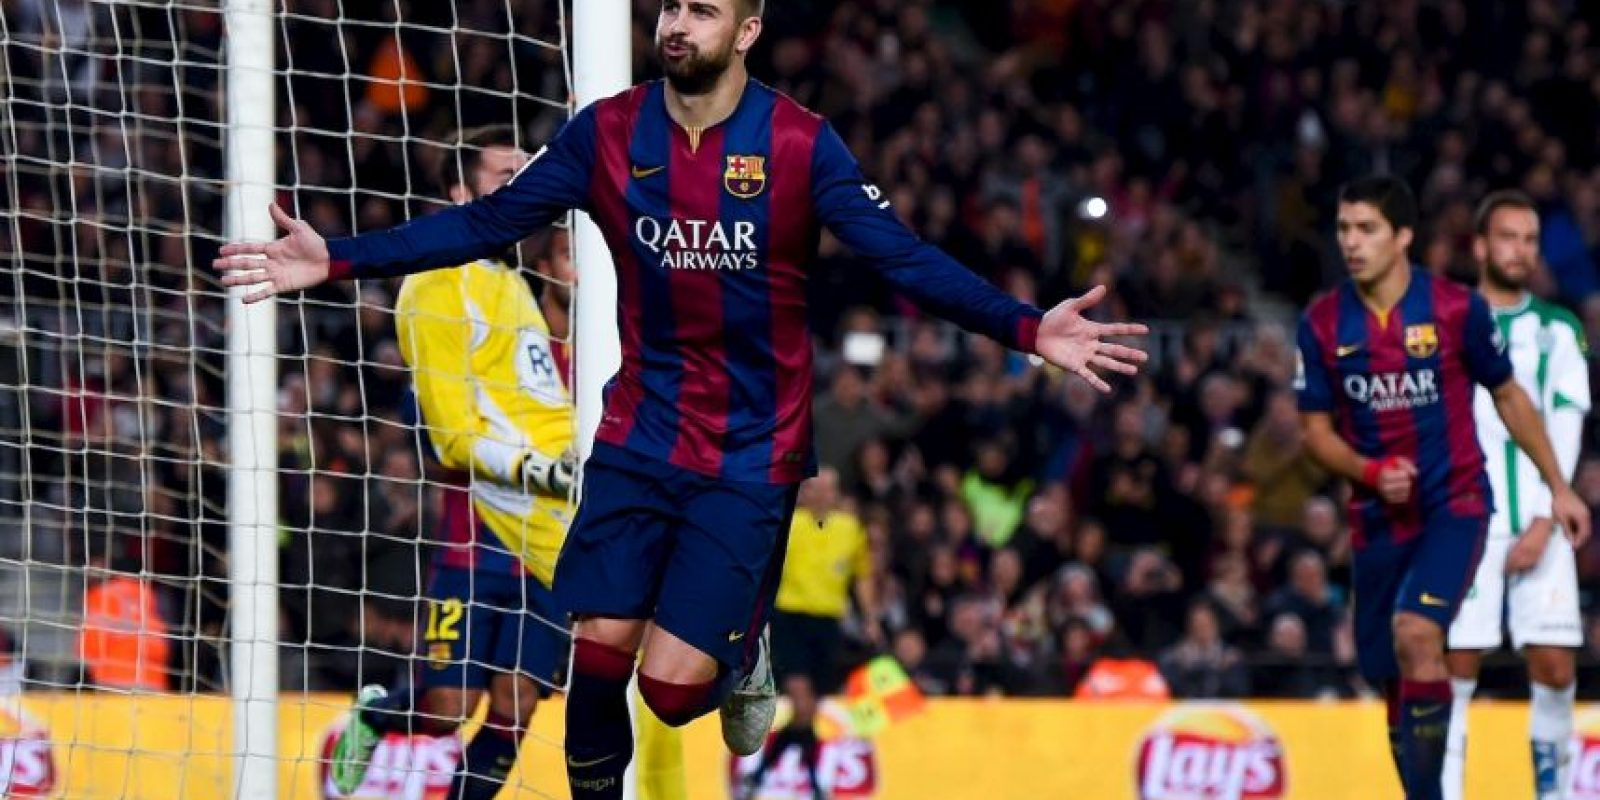 Nació el 2 de febrero de 1987 en Barcelona, España. Foto:Getty Images